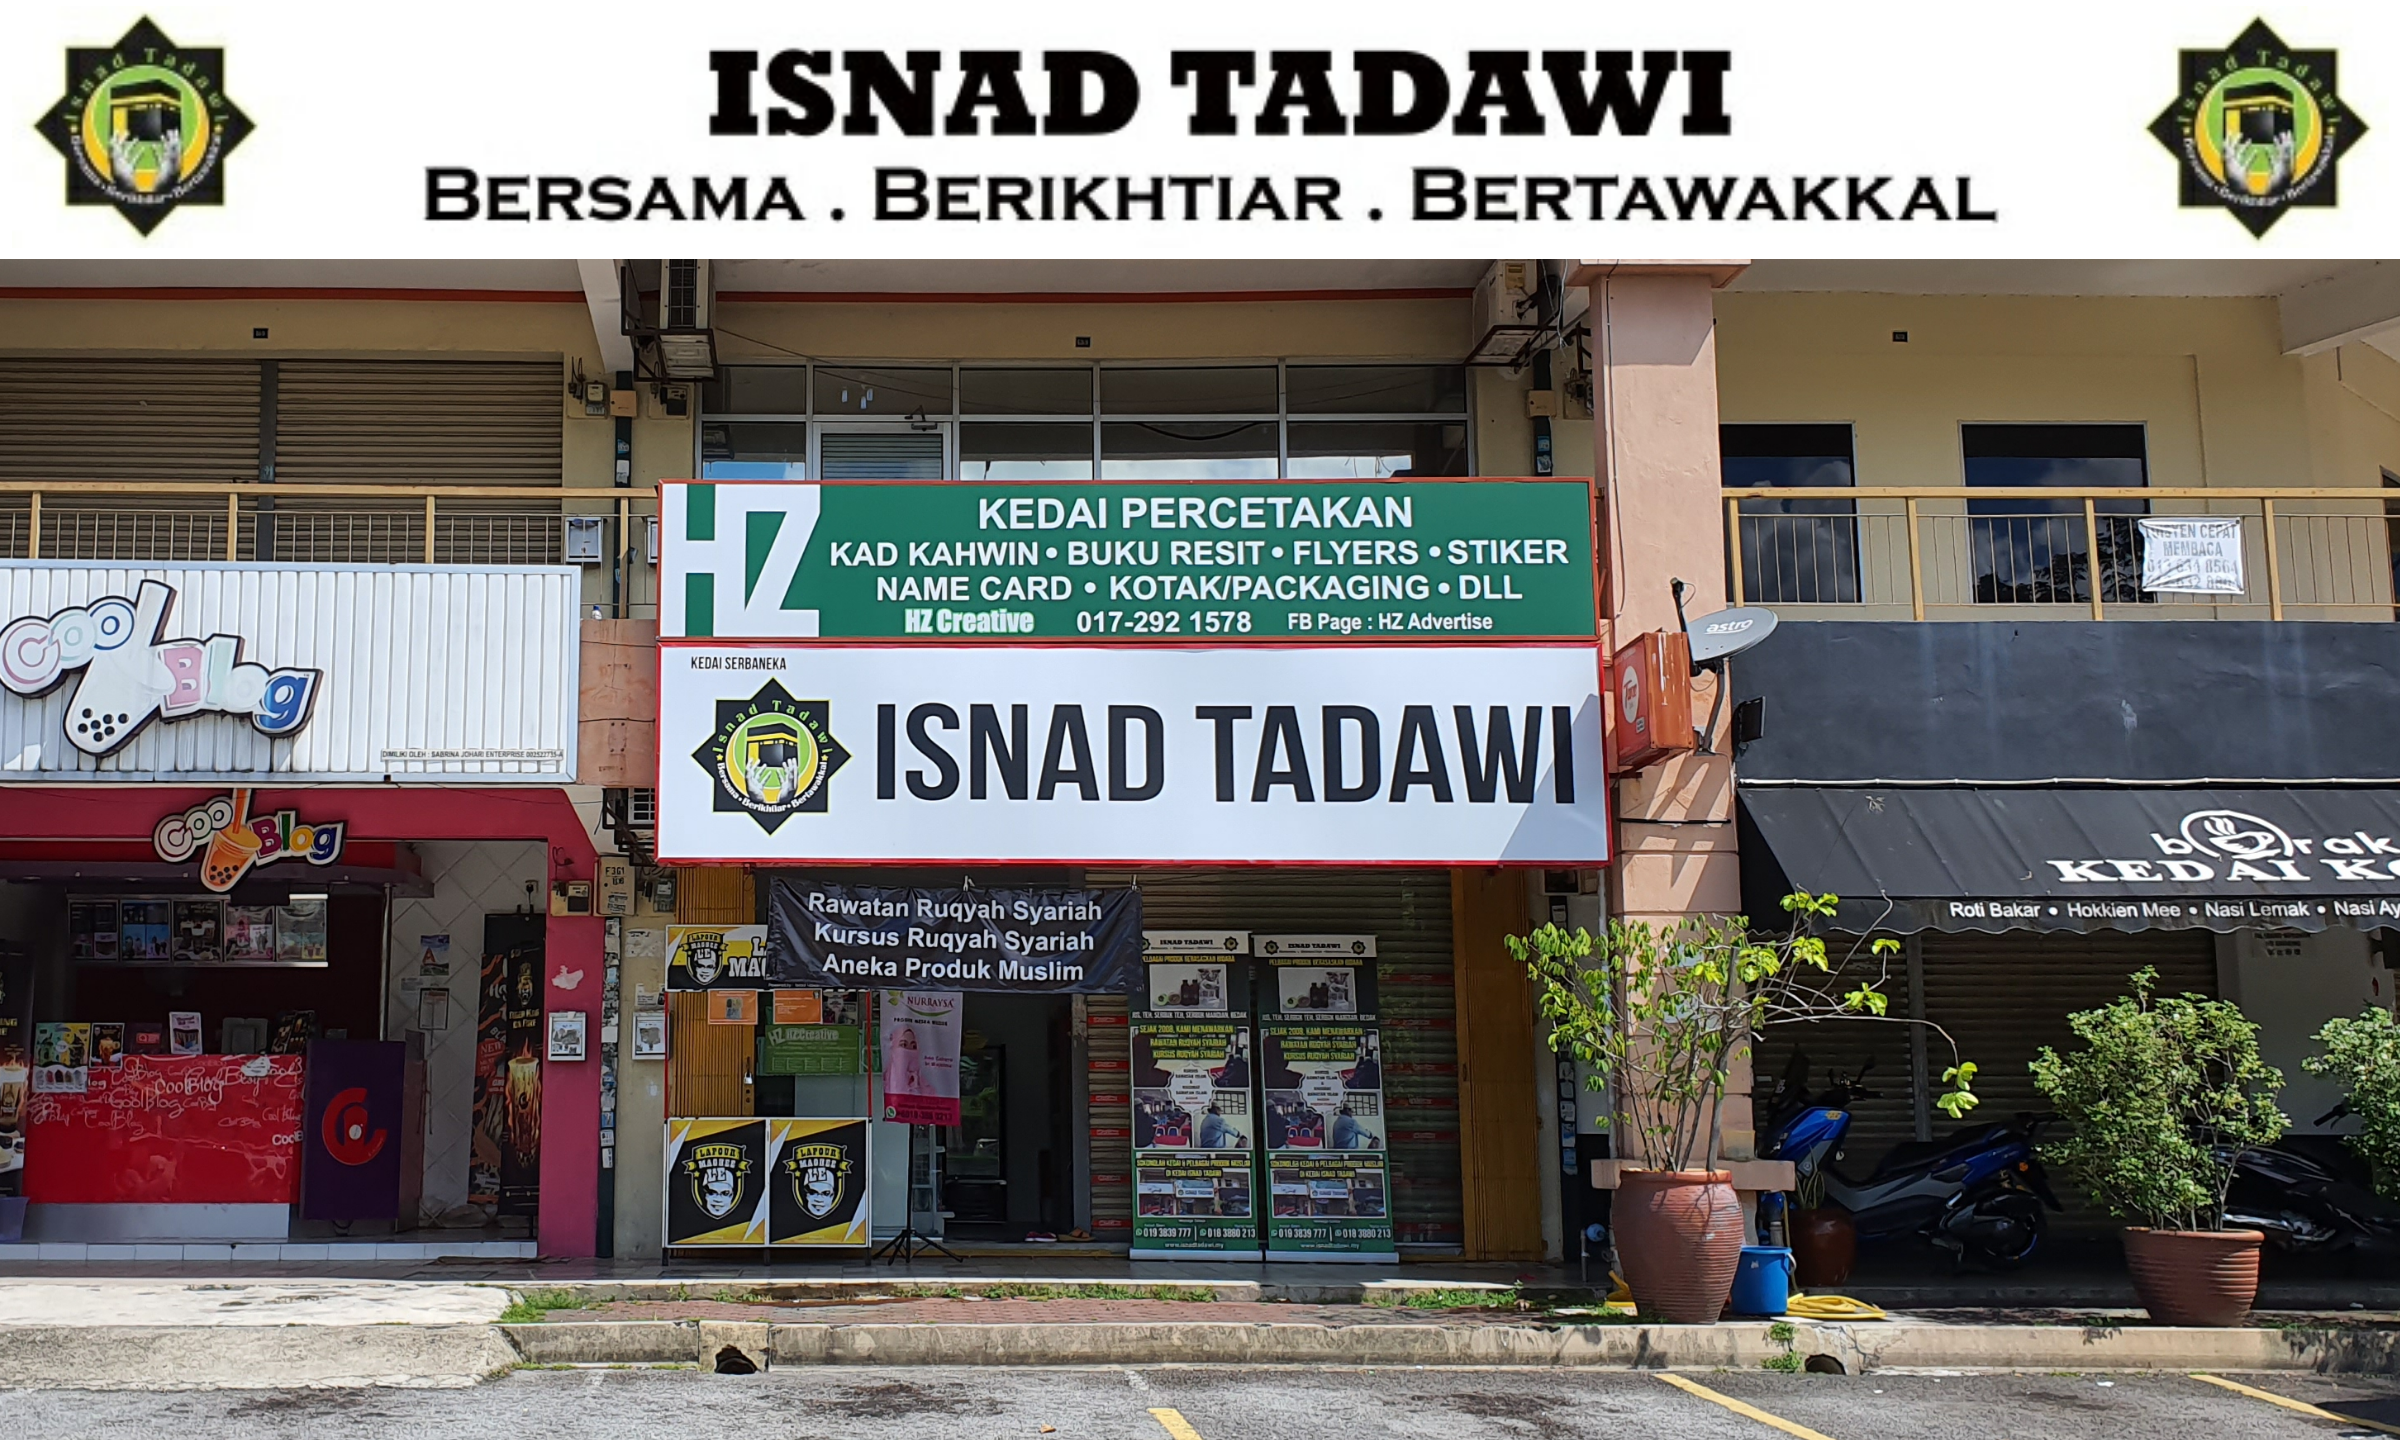 Pusat Rawatan Islam Isnad Tadawi .png